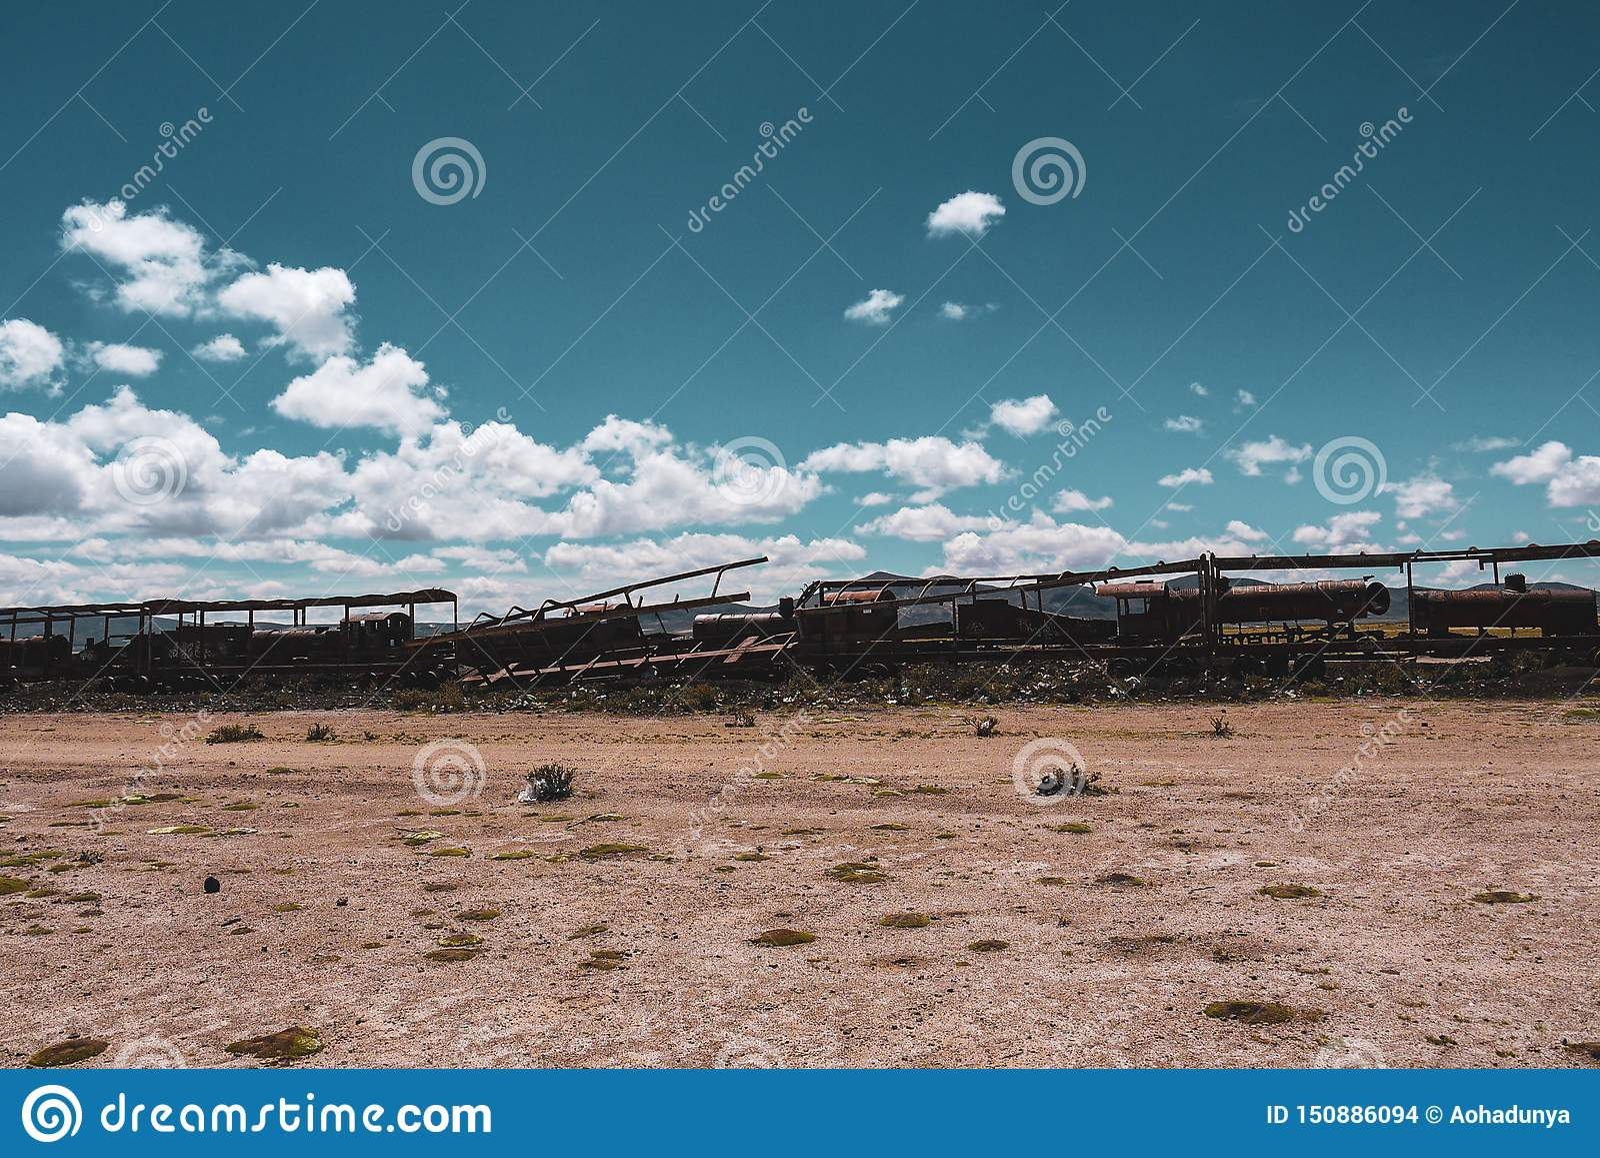 Кладбище поезда в Саларе de Uyuni